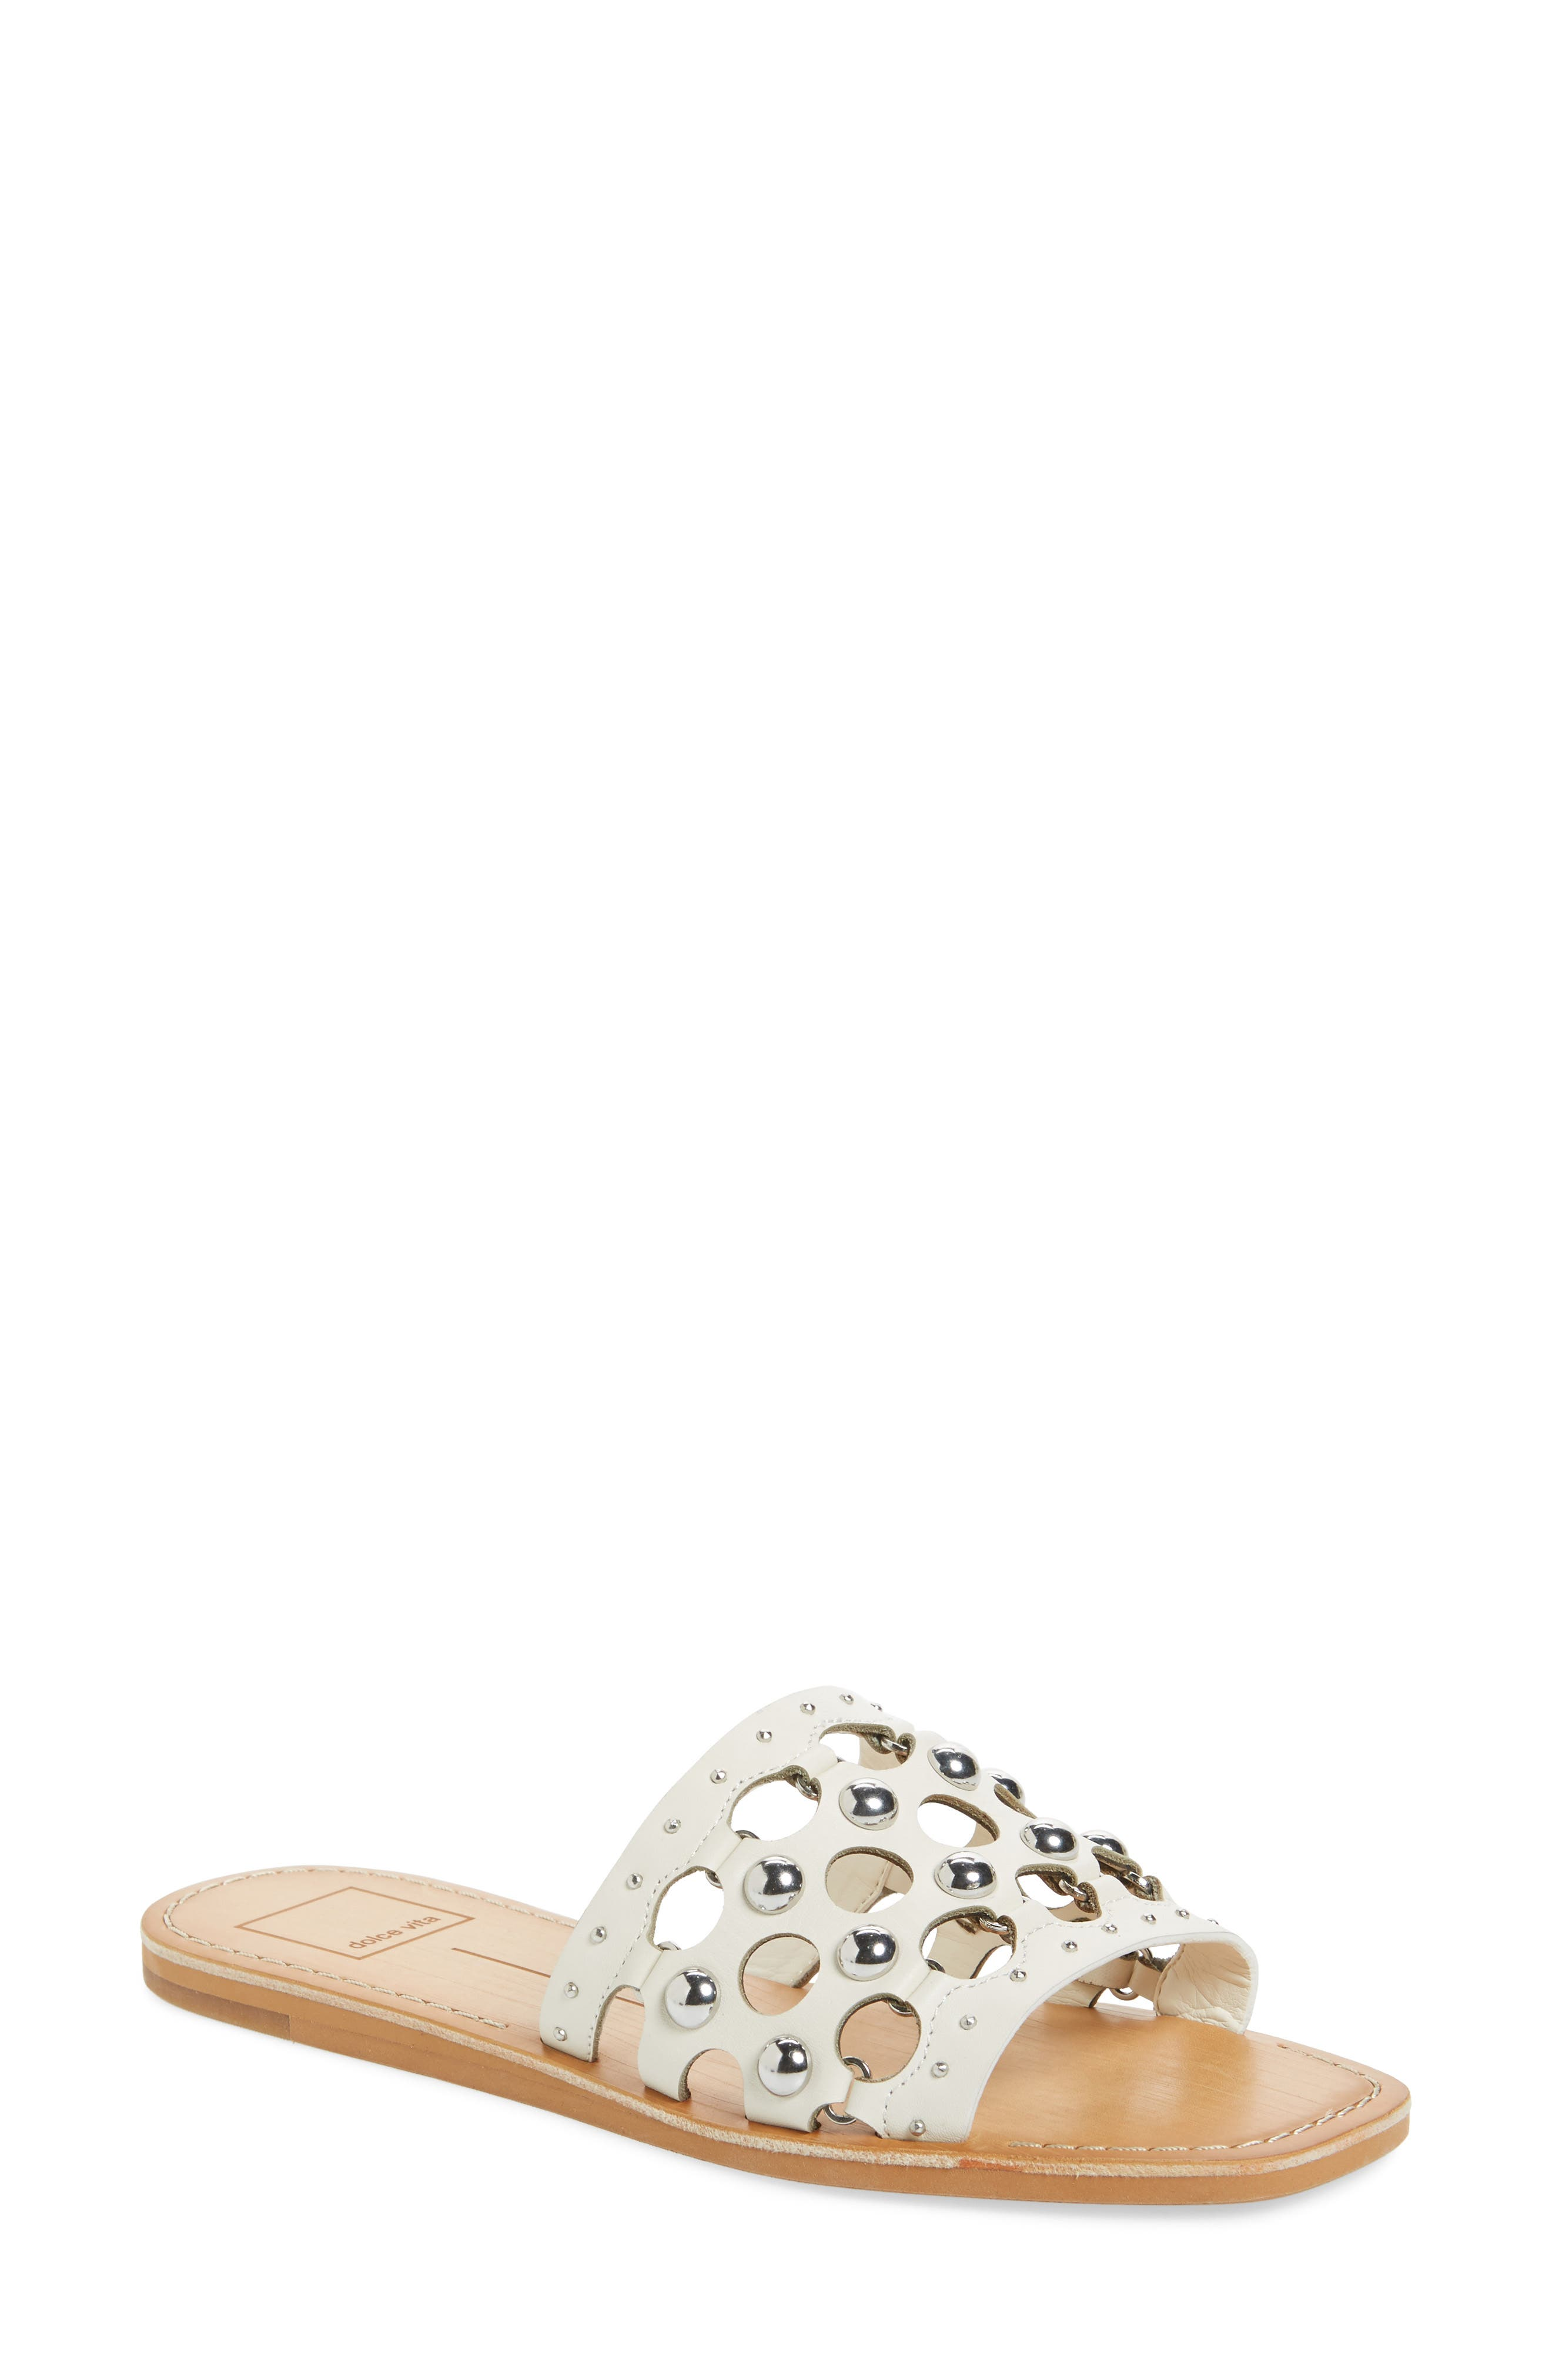 Celita Perforated Studded Slide Sandal,                         Main,                         color, White